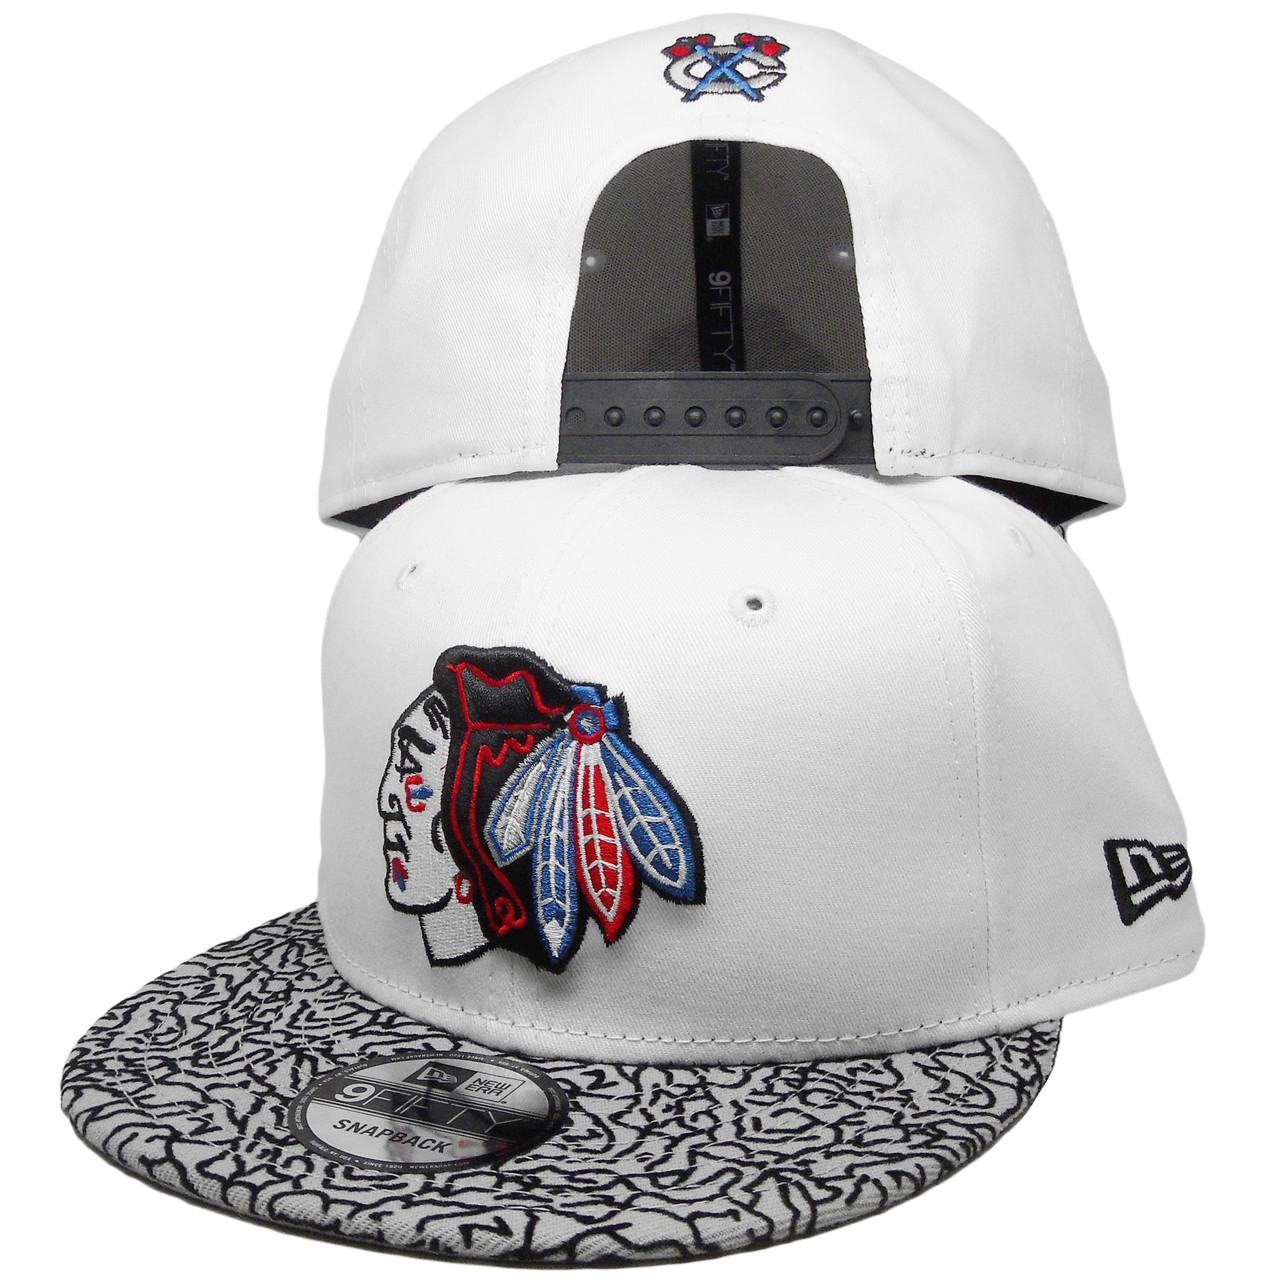 315fa6717 Chicago Blackhawks New Era 9Fity Custom Snapback Hat - White, Cement, Red -  ECapsUnlimited.com